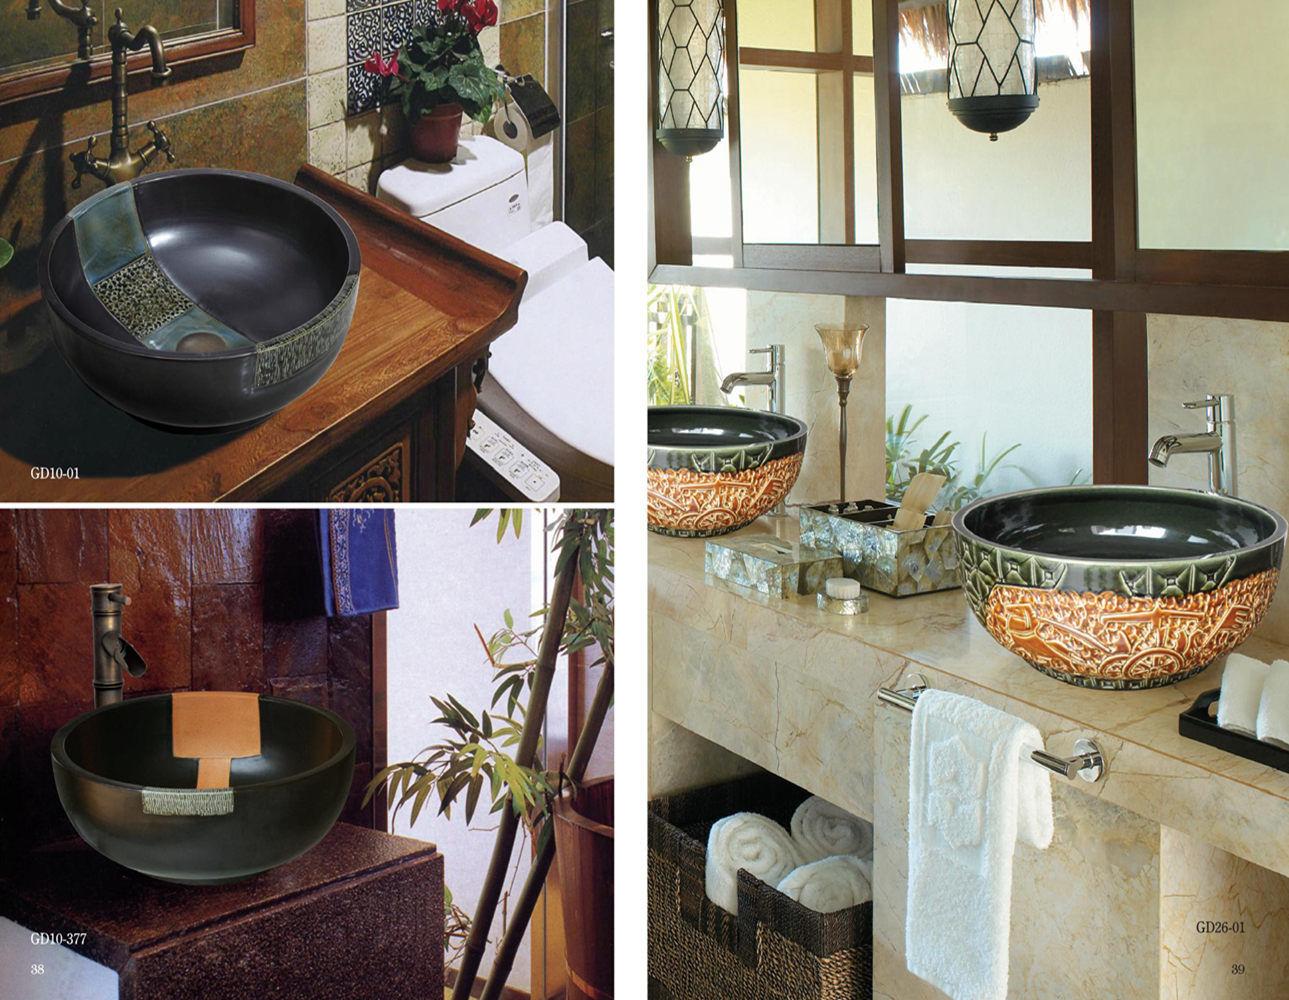 Lavatory Art Ceramic Wash Basin (D18)